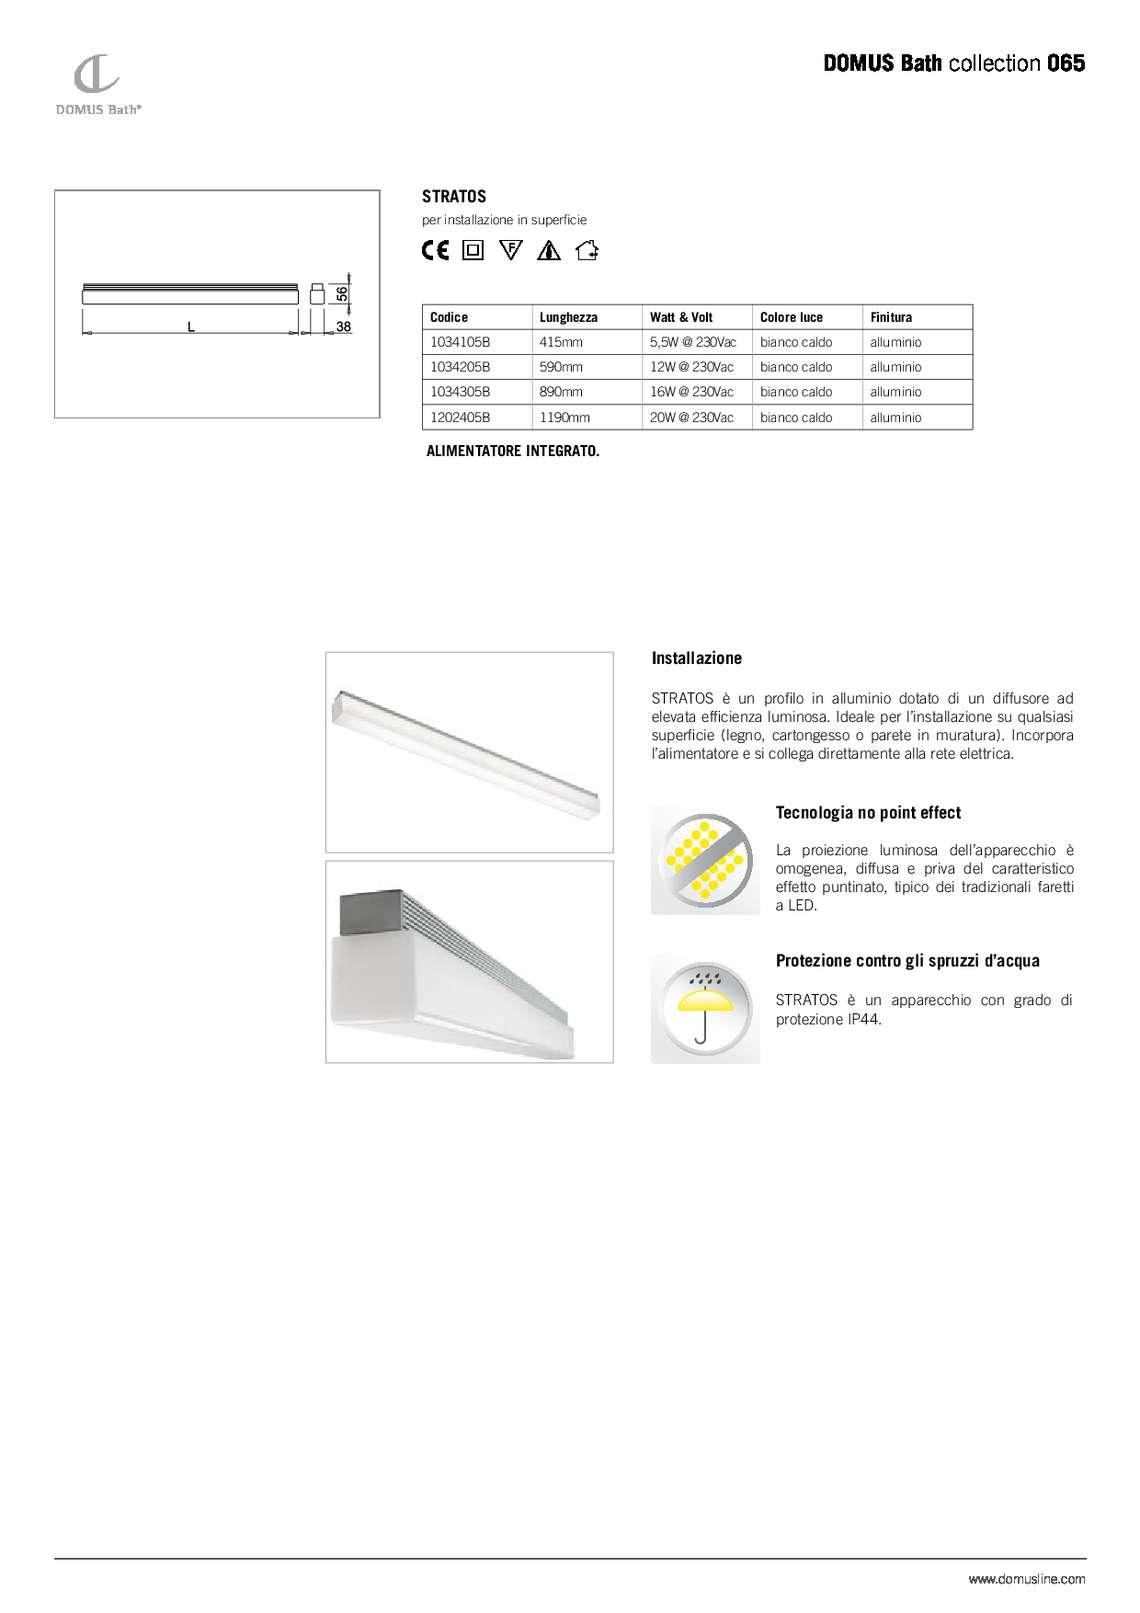 domus-line-illuminazione_26_065.jpg